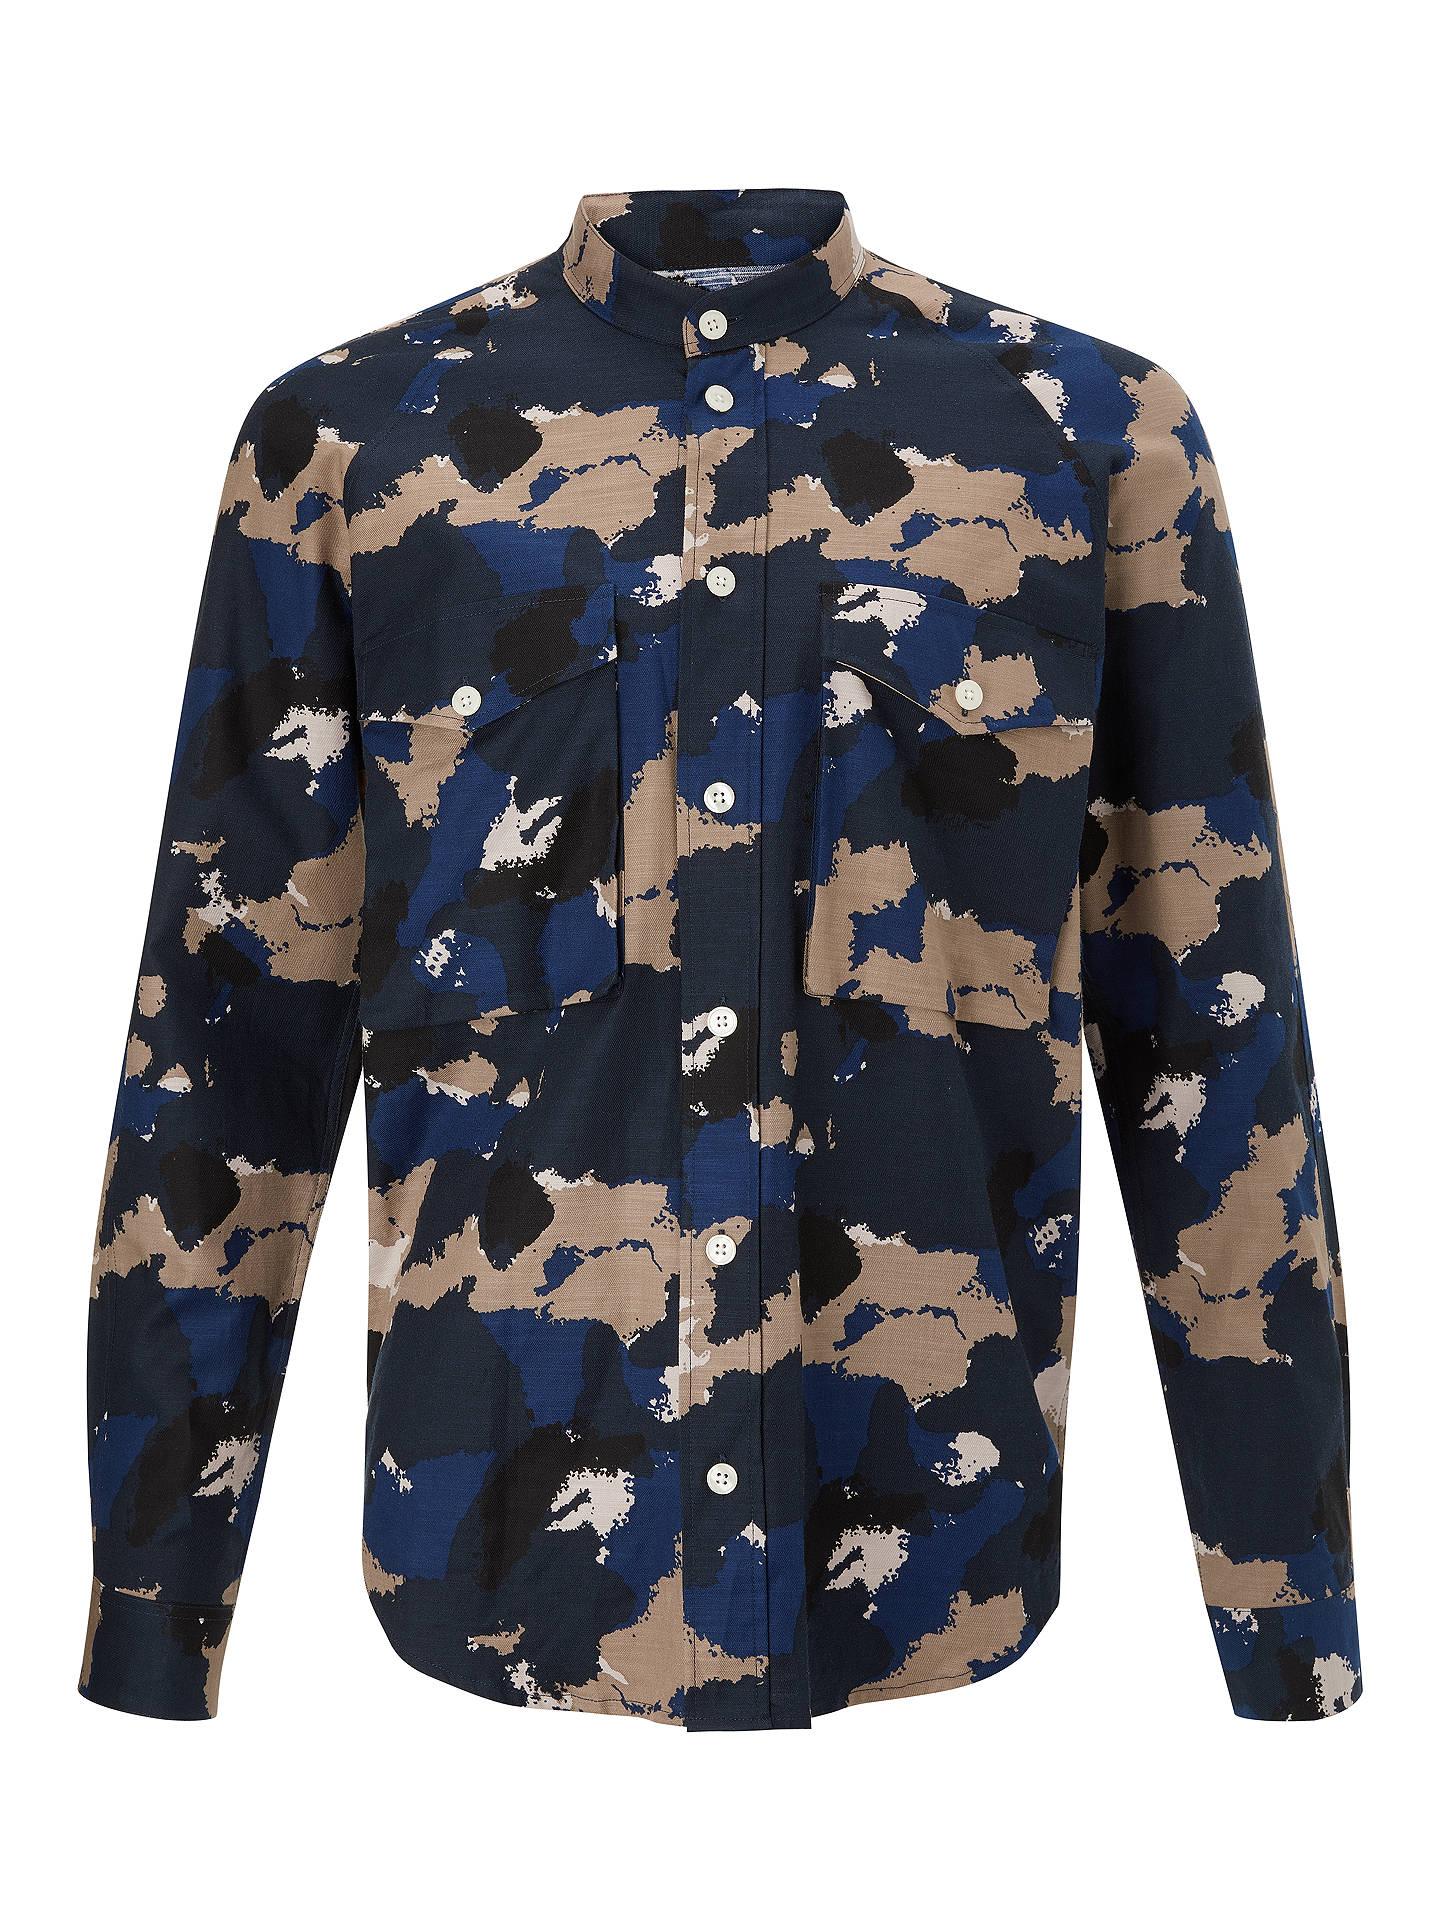 d497eed6009de6 ... Buy Samsoe   Samsoe Cayo Long Sleeve Camo Shirt